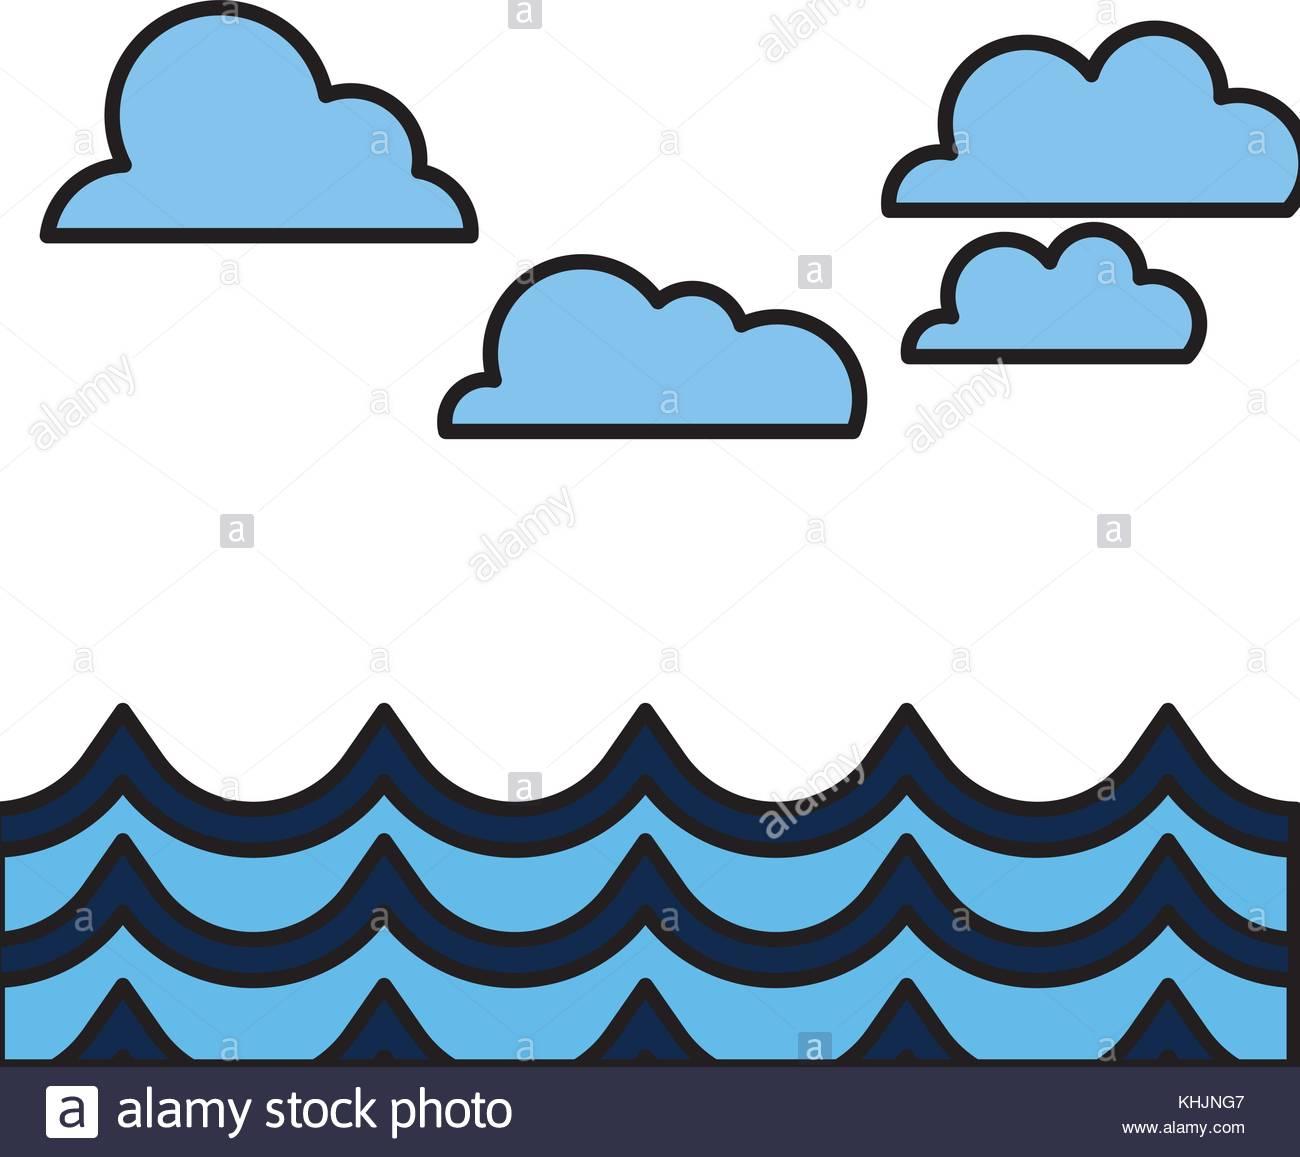 1300x1157 Ocean Waves Art Stock Photos Amp Ocean Waves Art Stock Images